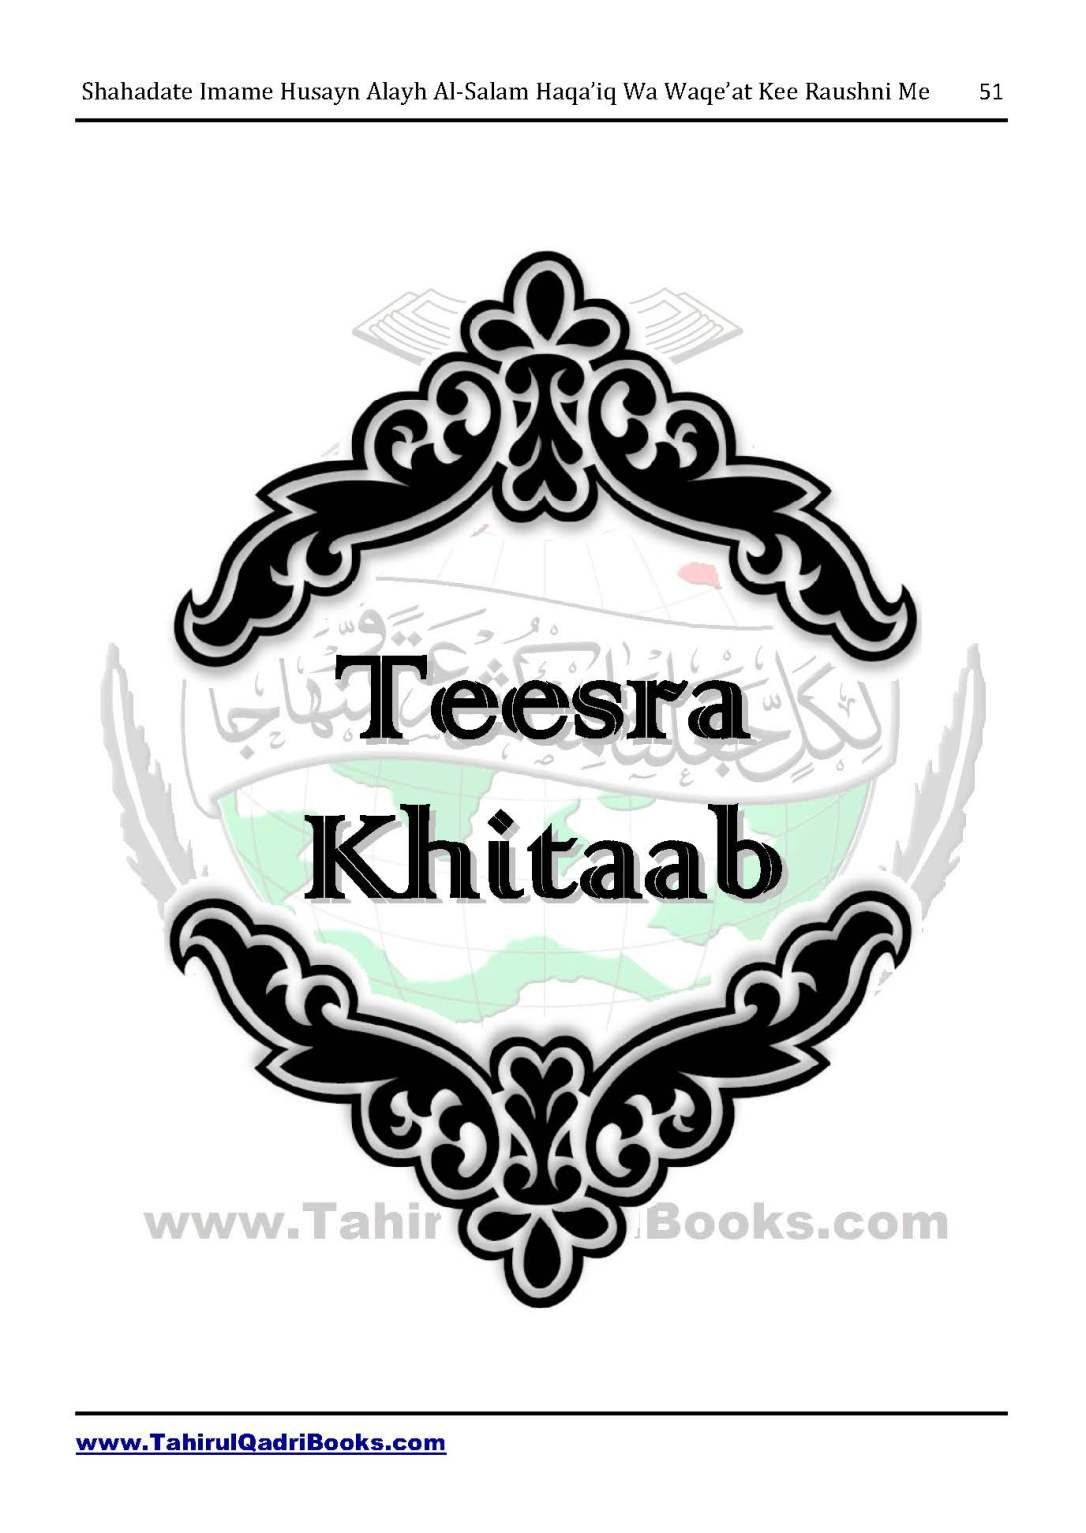 shahadate-imame-husayn-alayh-is-salam-haqaiq-wa-waqe_at-kee-raushni-me-in-roman-urdu-unlocked_Page_51